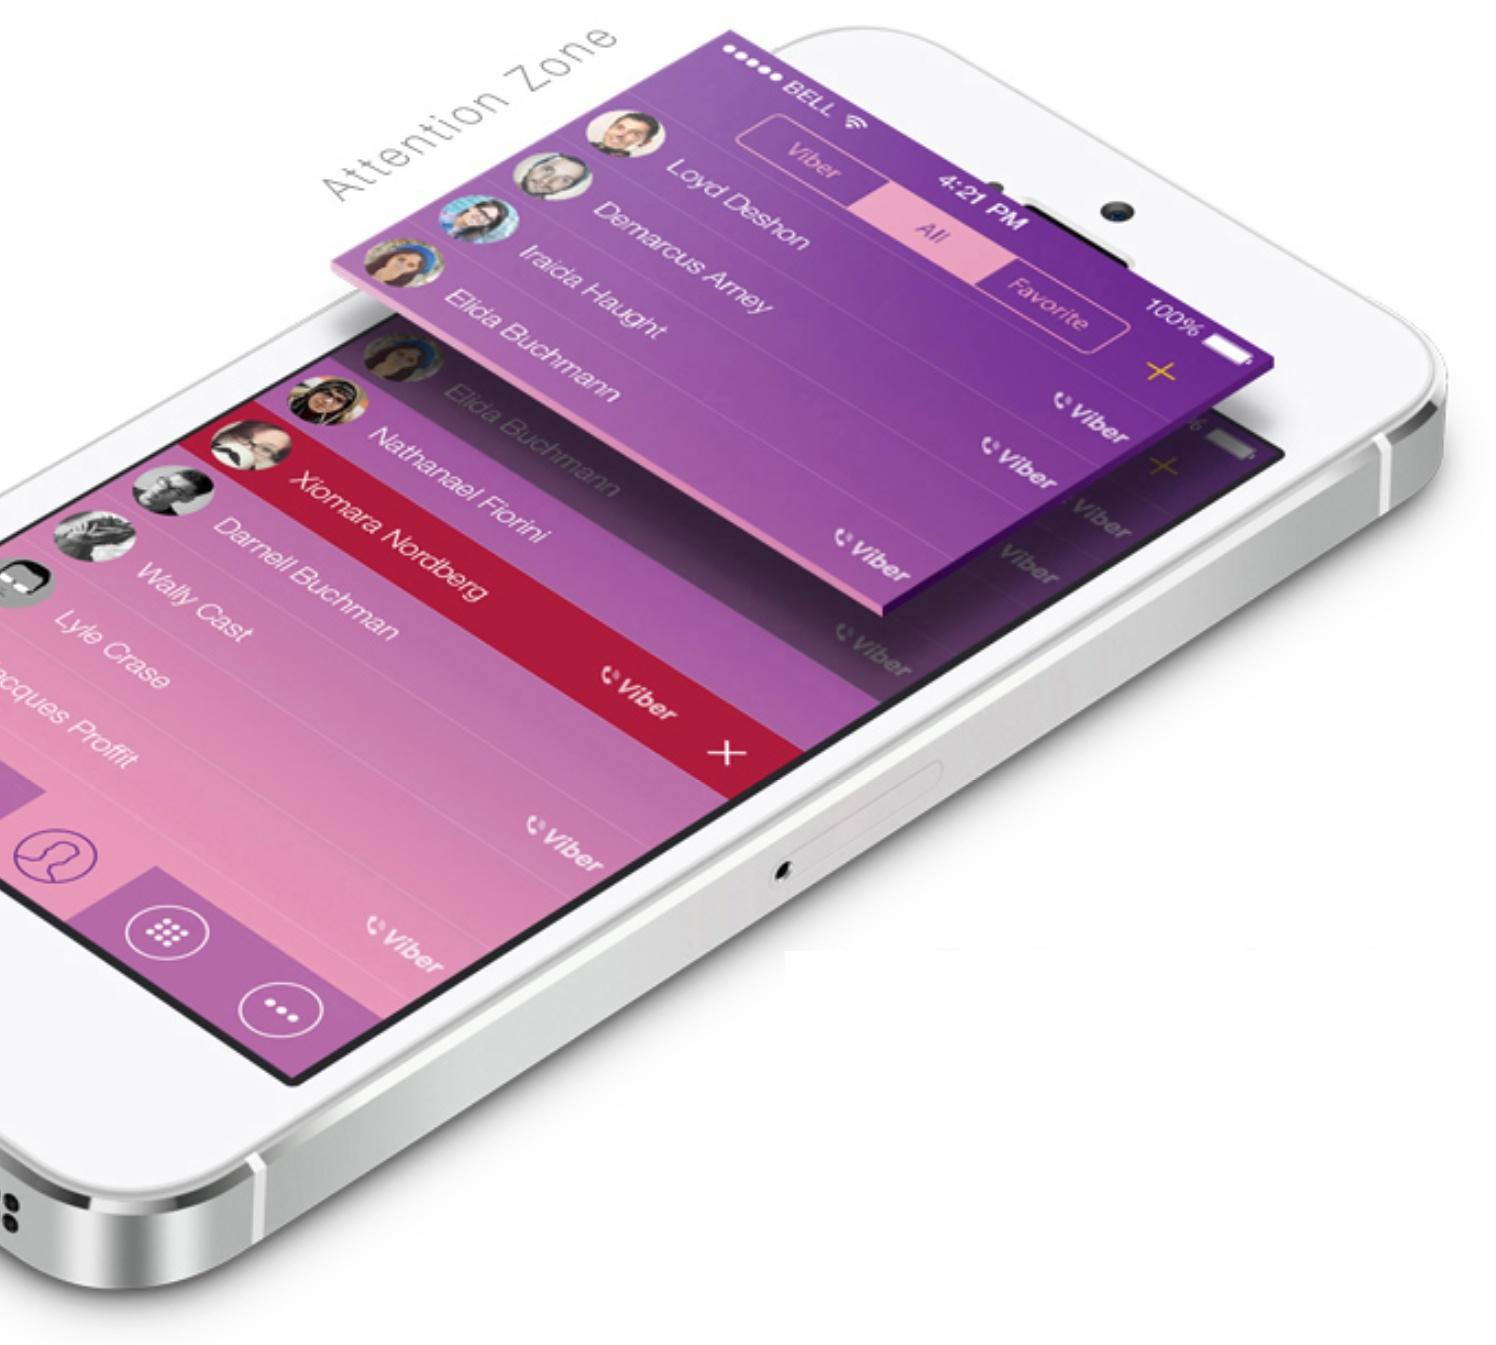 Viber iOS 7 concept (image 003)